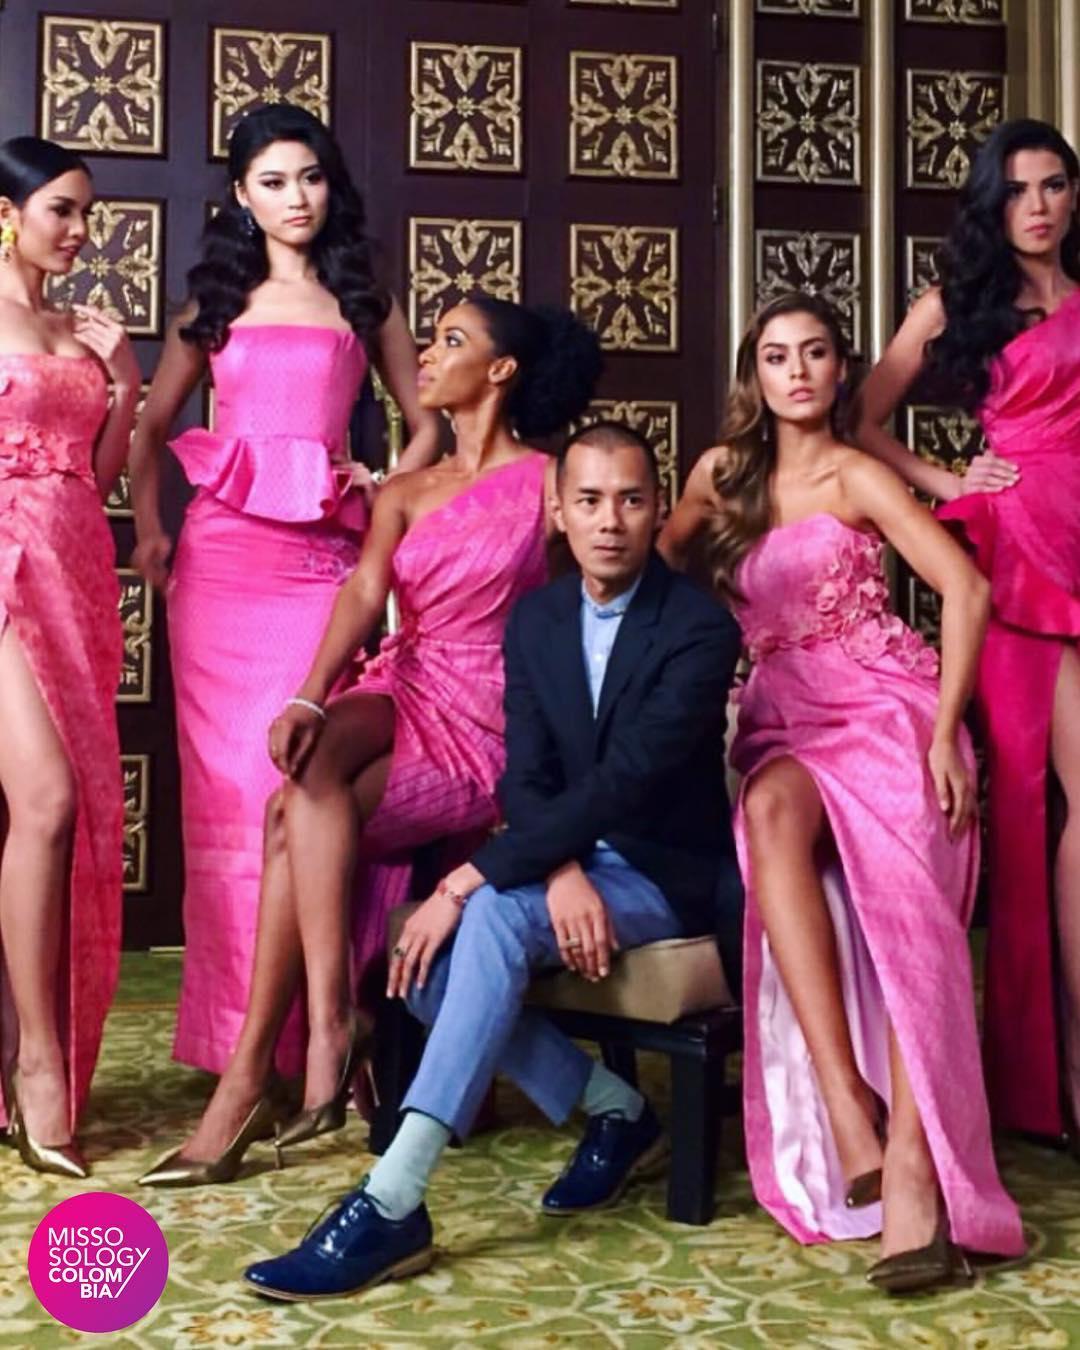 thai night gala dinner de candidatas a miss universe 2018. - Página 8 45717710